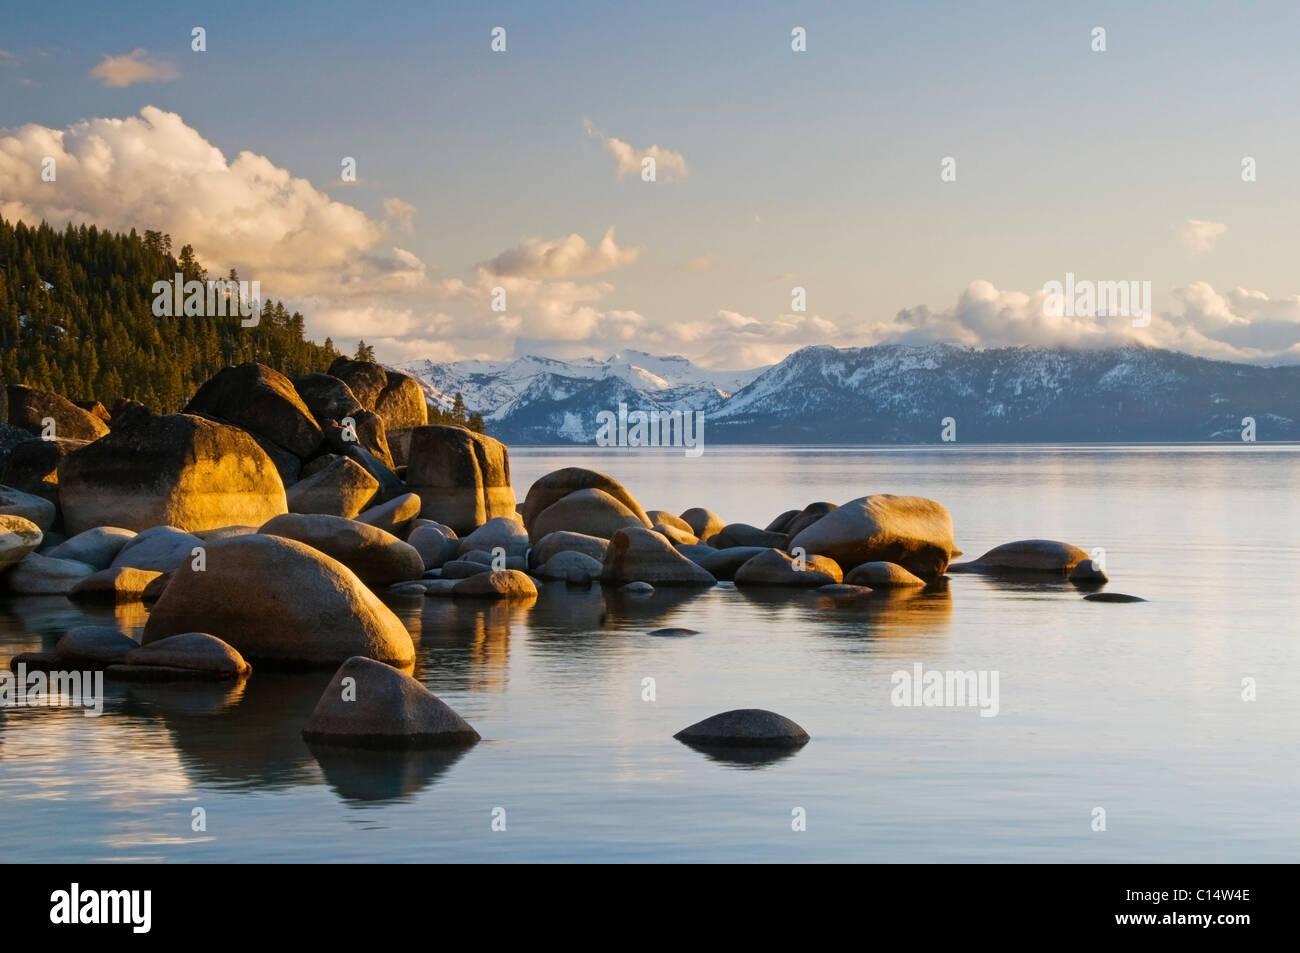 Golden afternoon light illuminates granite boulders on the east shore of Lake Tahoe, NV. - Stock Image